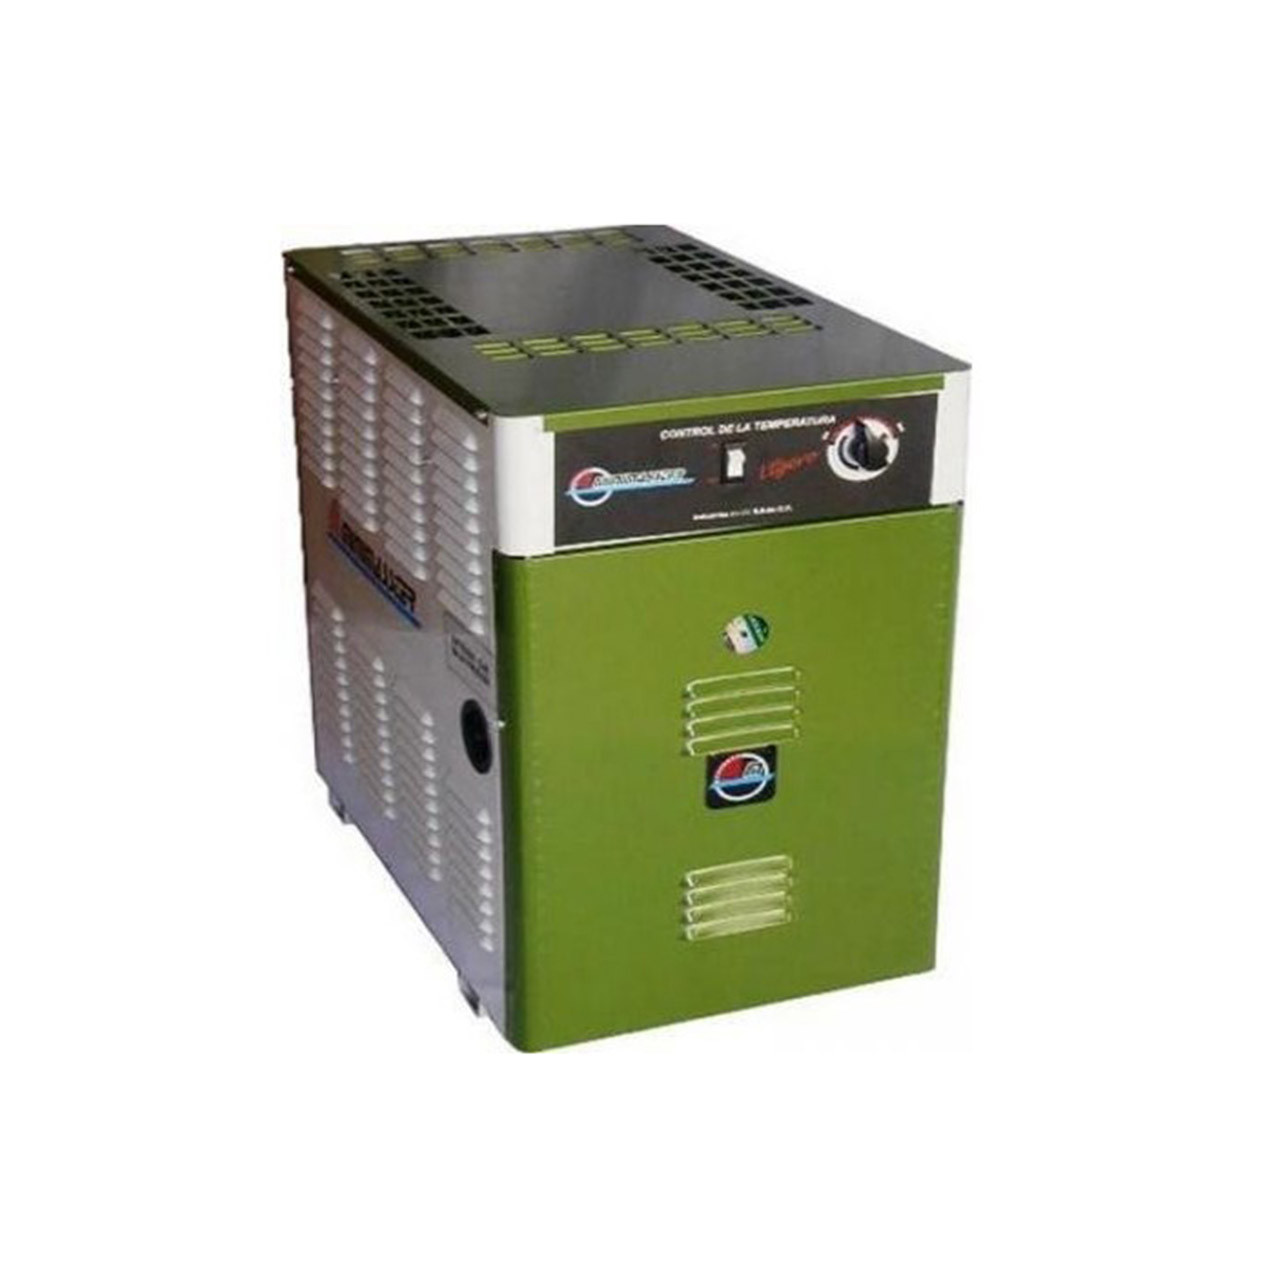 Calentador mini de agua para servicios generales con inductor MMS MassTerCal